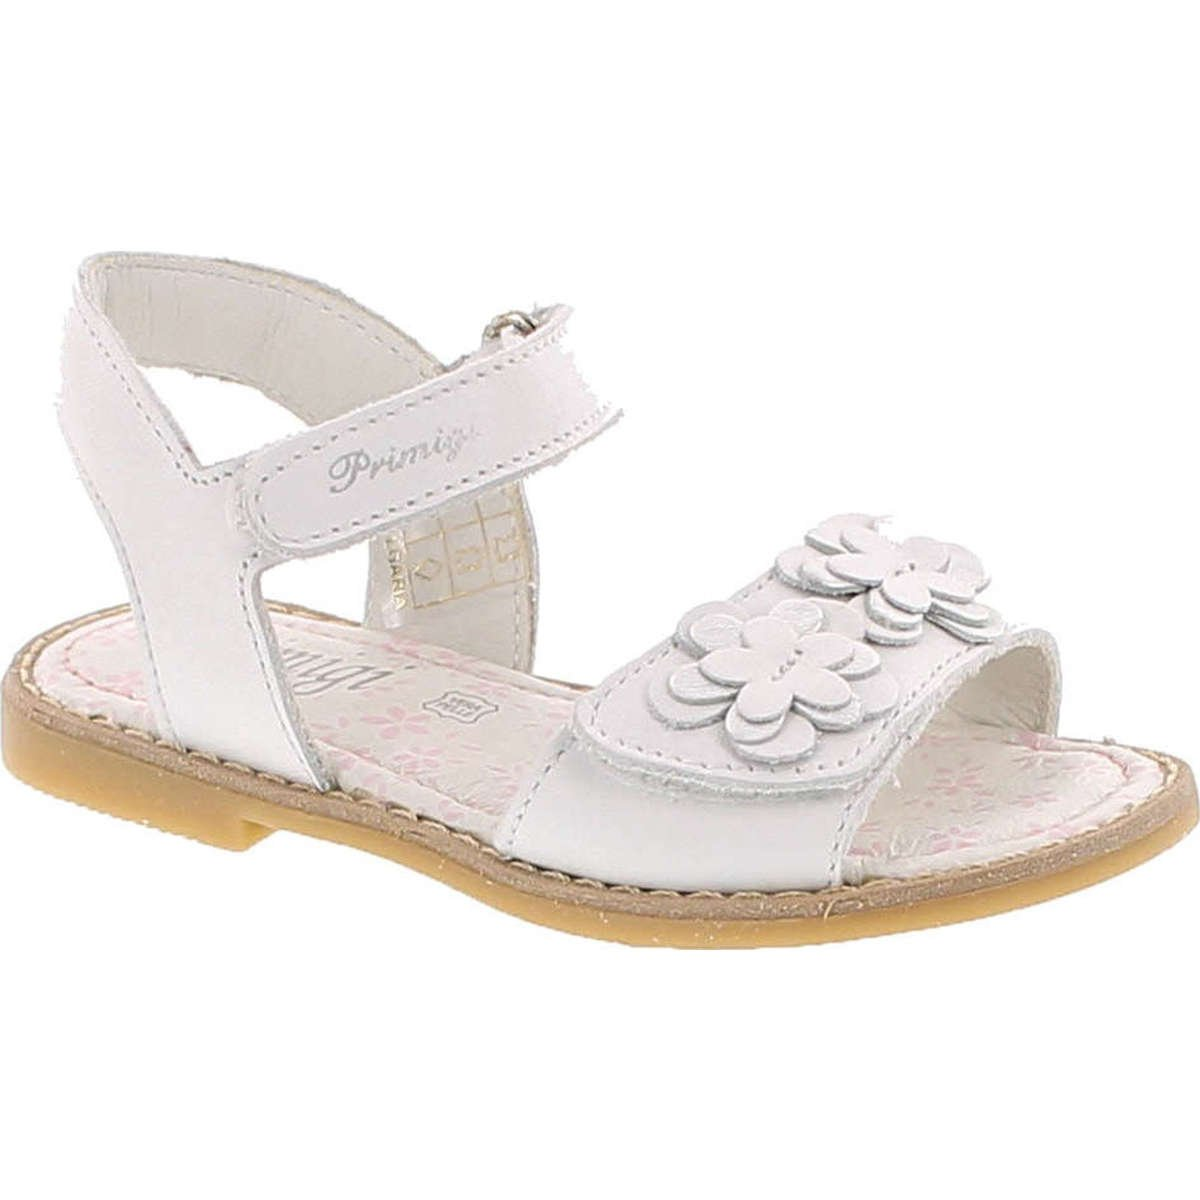 Primigi Girls 7097 Leather Fashion Sandals